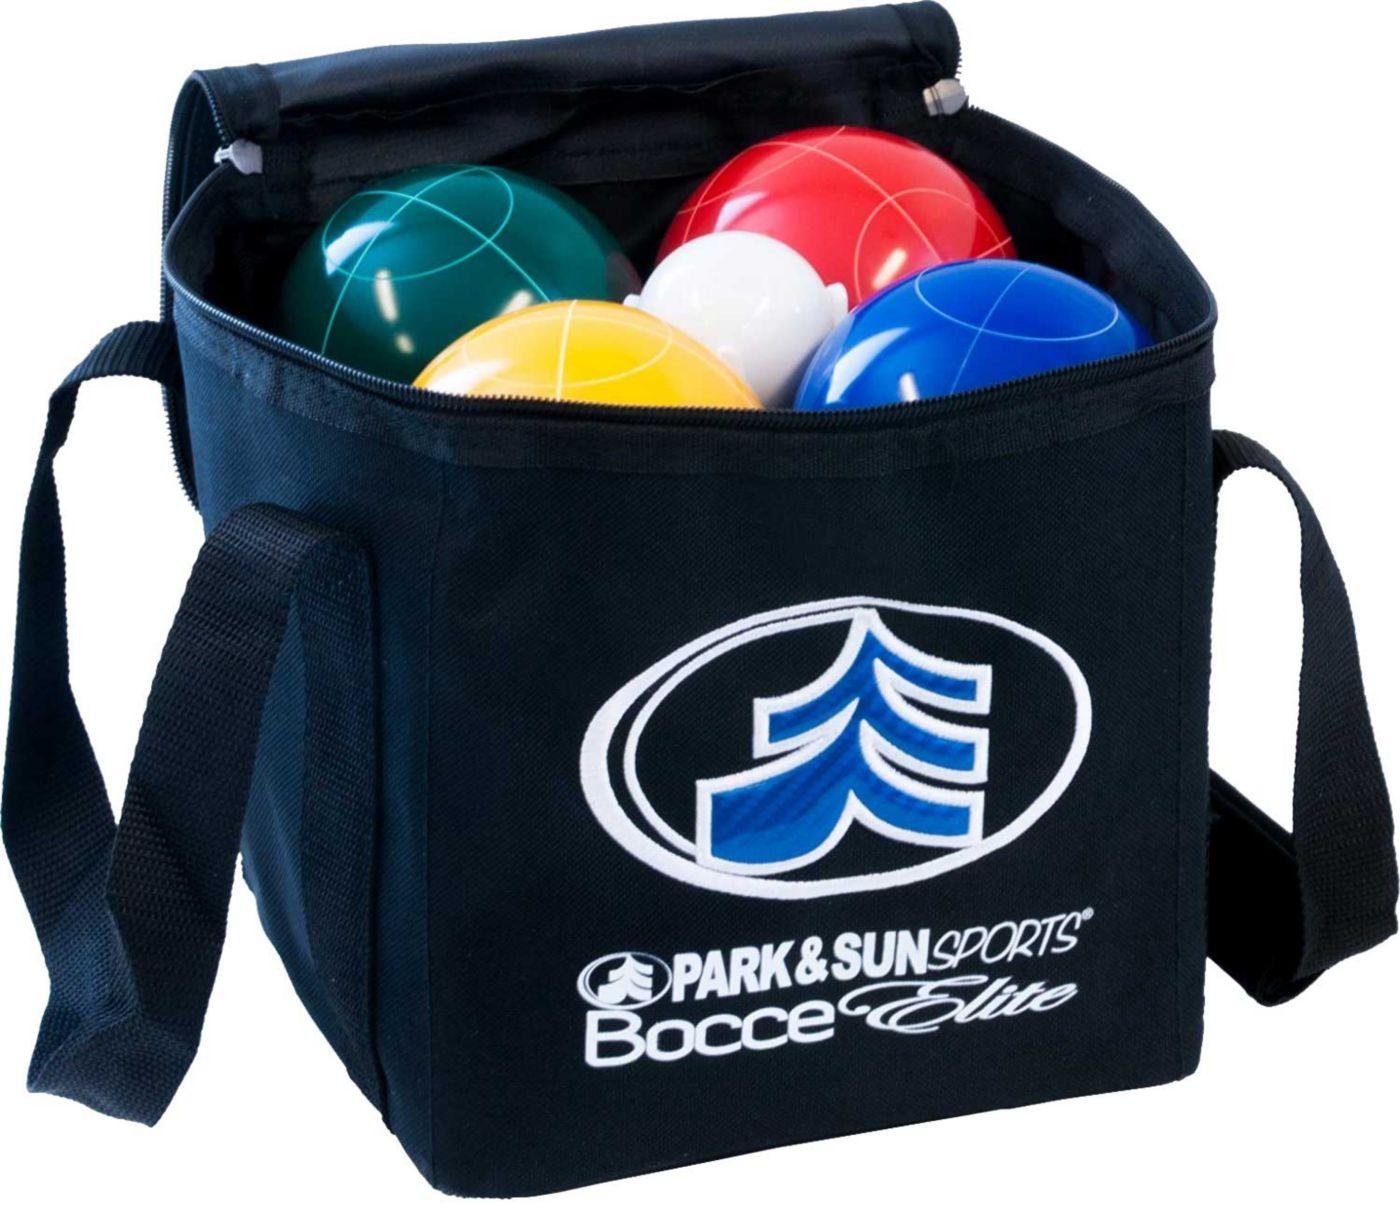 Park and Sun Sports Pro Elite 109mm Bocce Set